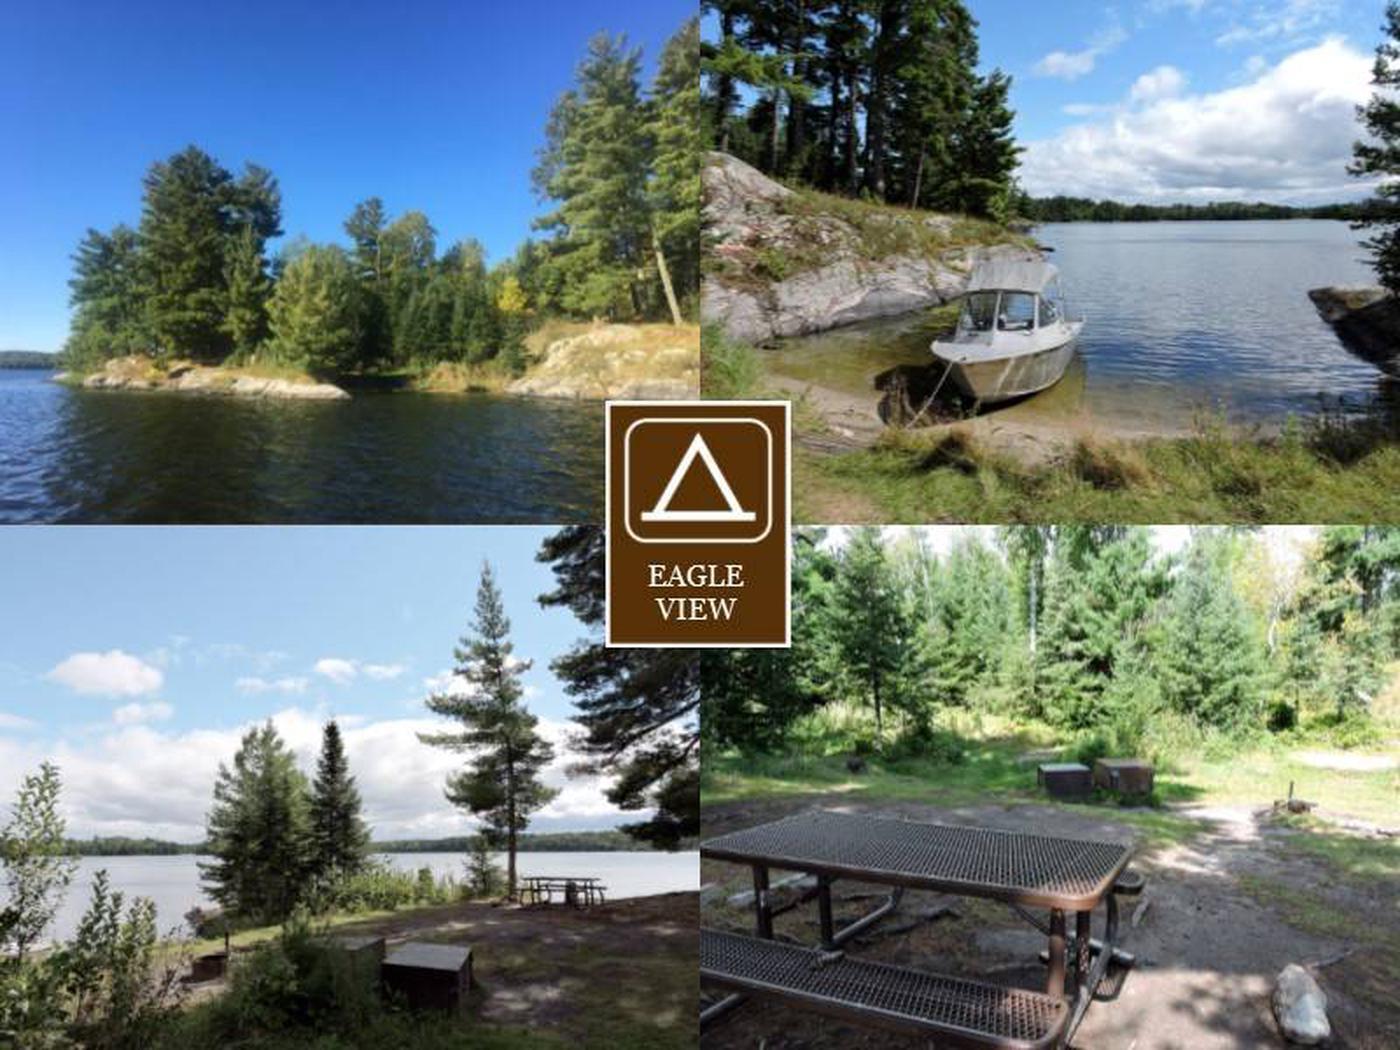 K7 - Eagle ViewEagle View campsite on Kabetogama Lake